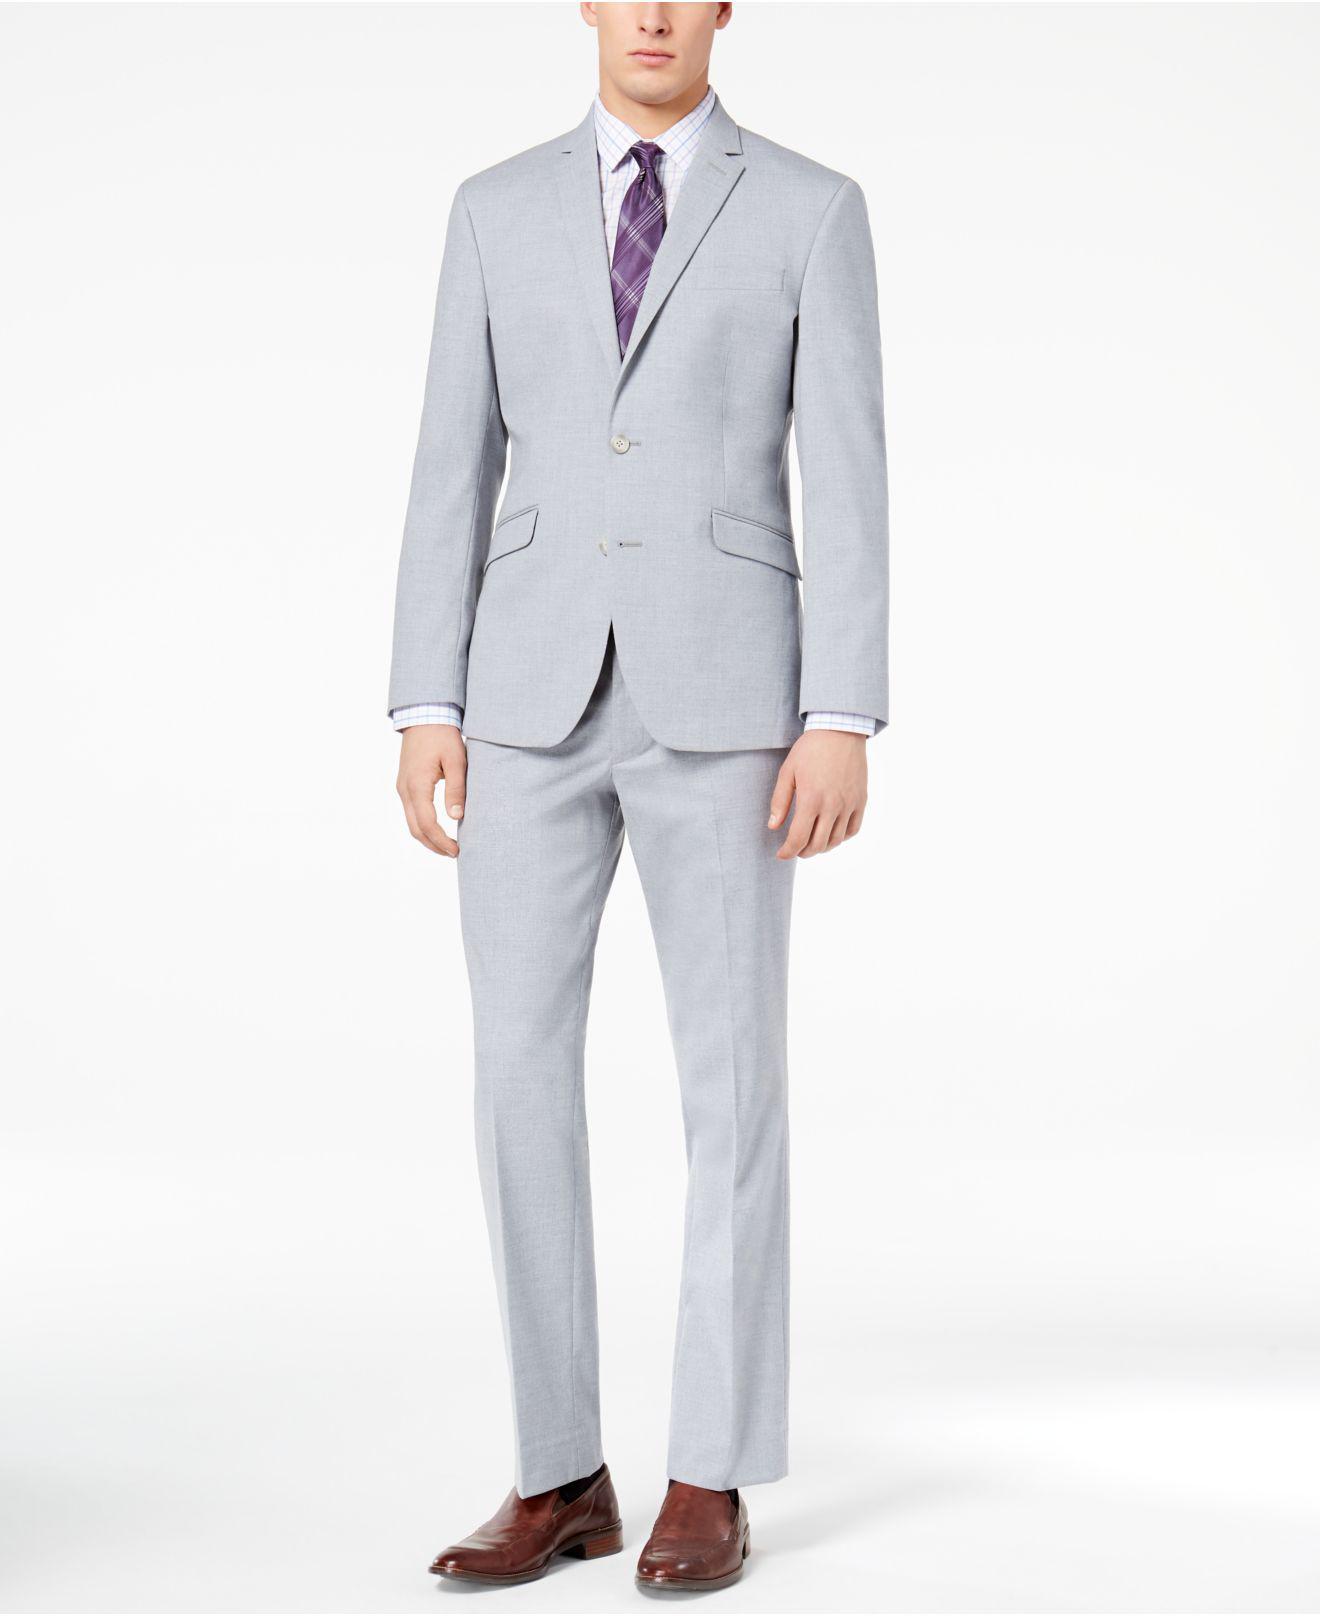 Kenneth Cole Reaction. Men s Techni-cole Slim-fit Stretch Light Blue  Sharkskin Suit f8ca8aa35